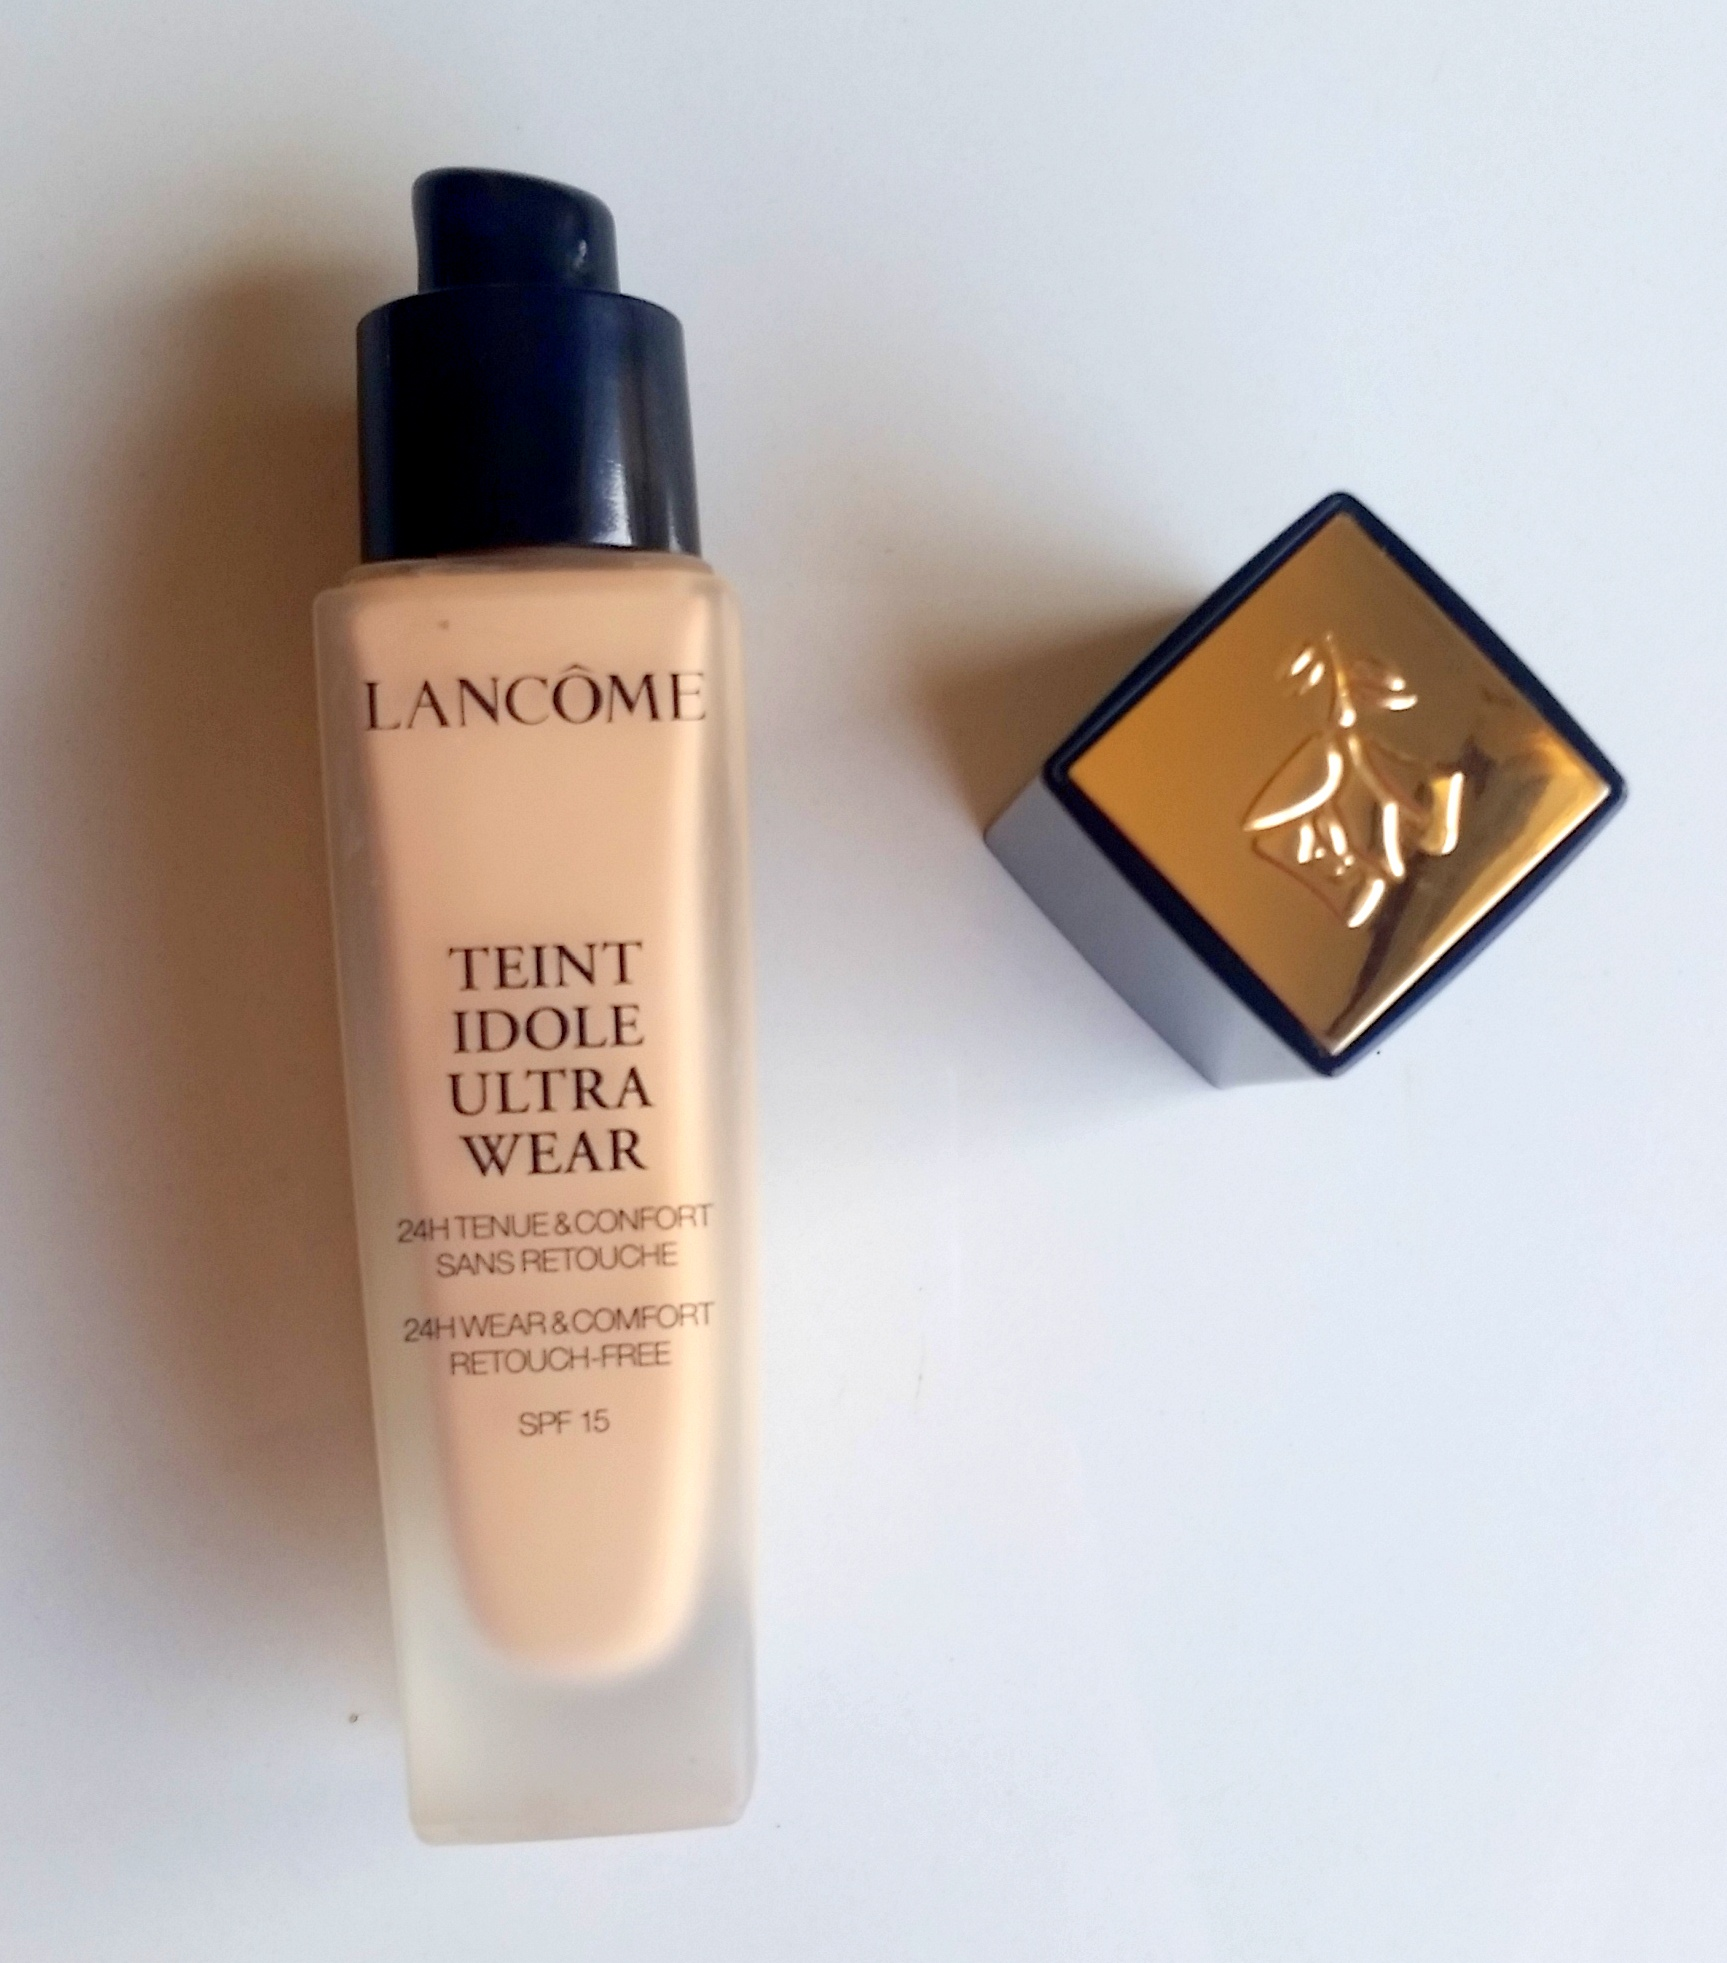 TESTED: Lancome Teint Idole Ultra Wear Foundation, Sugar & Spice